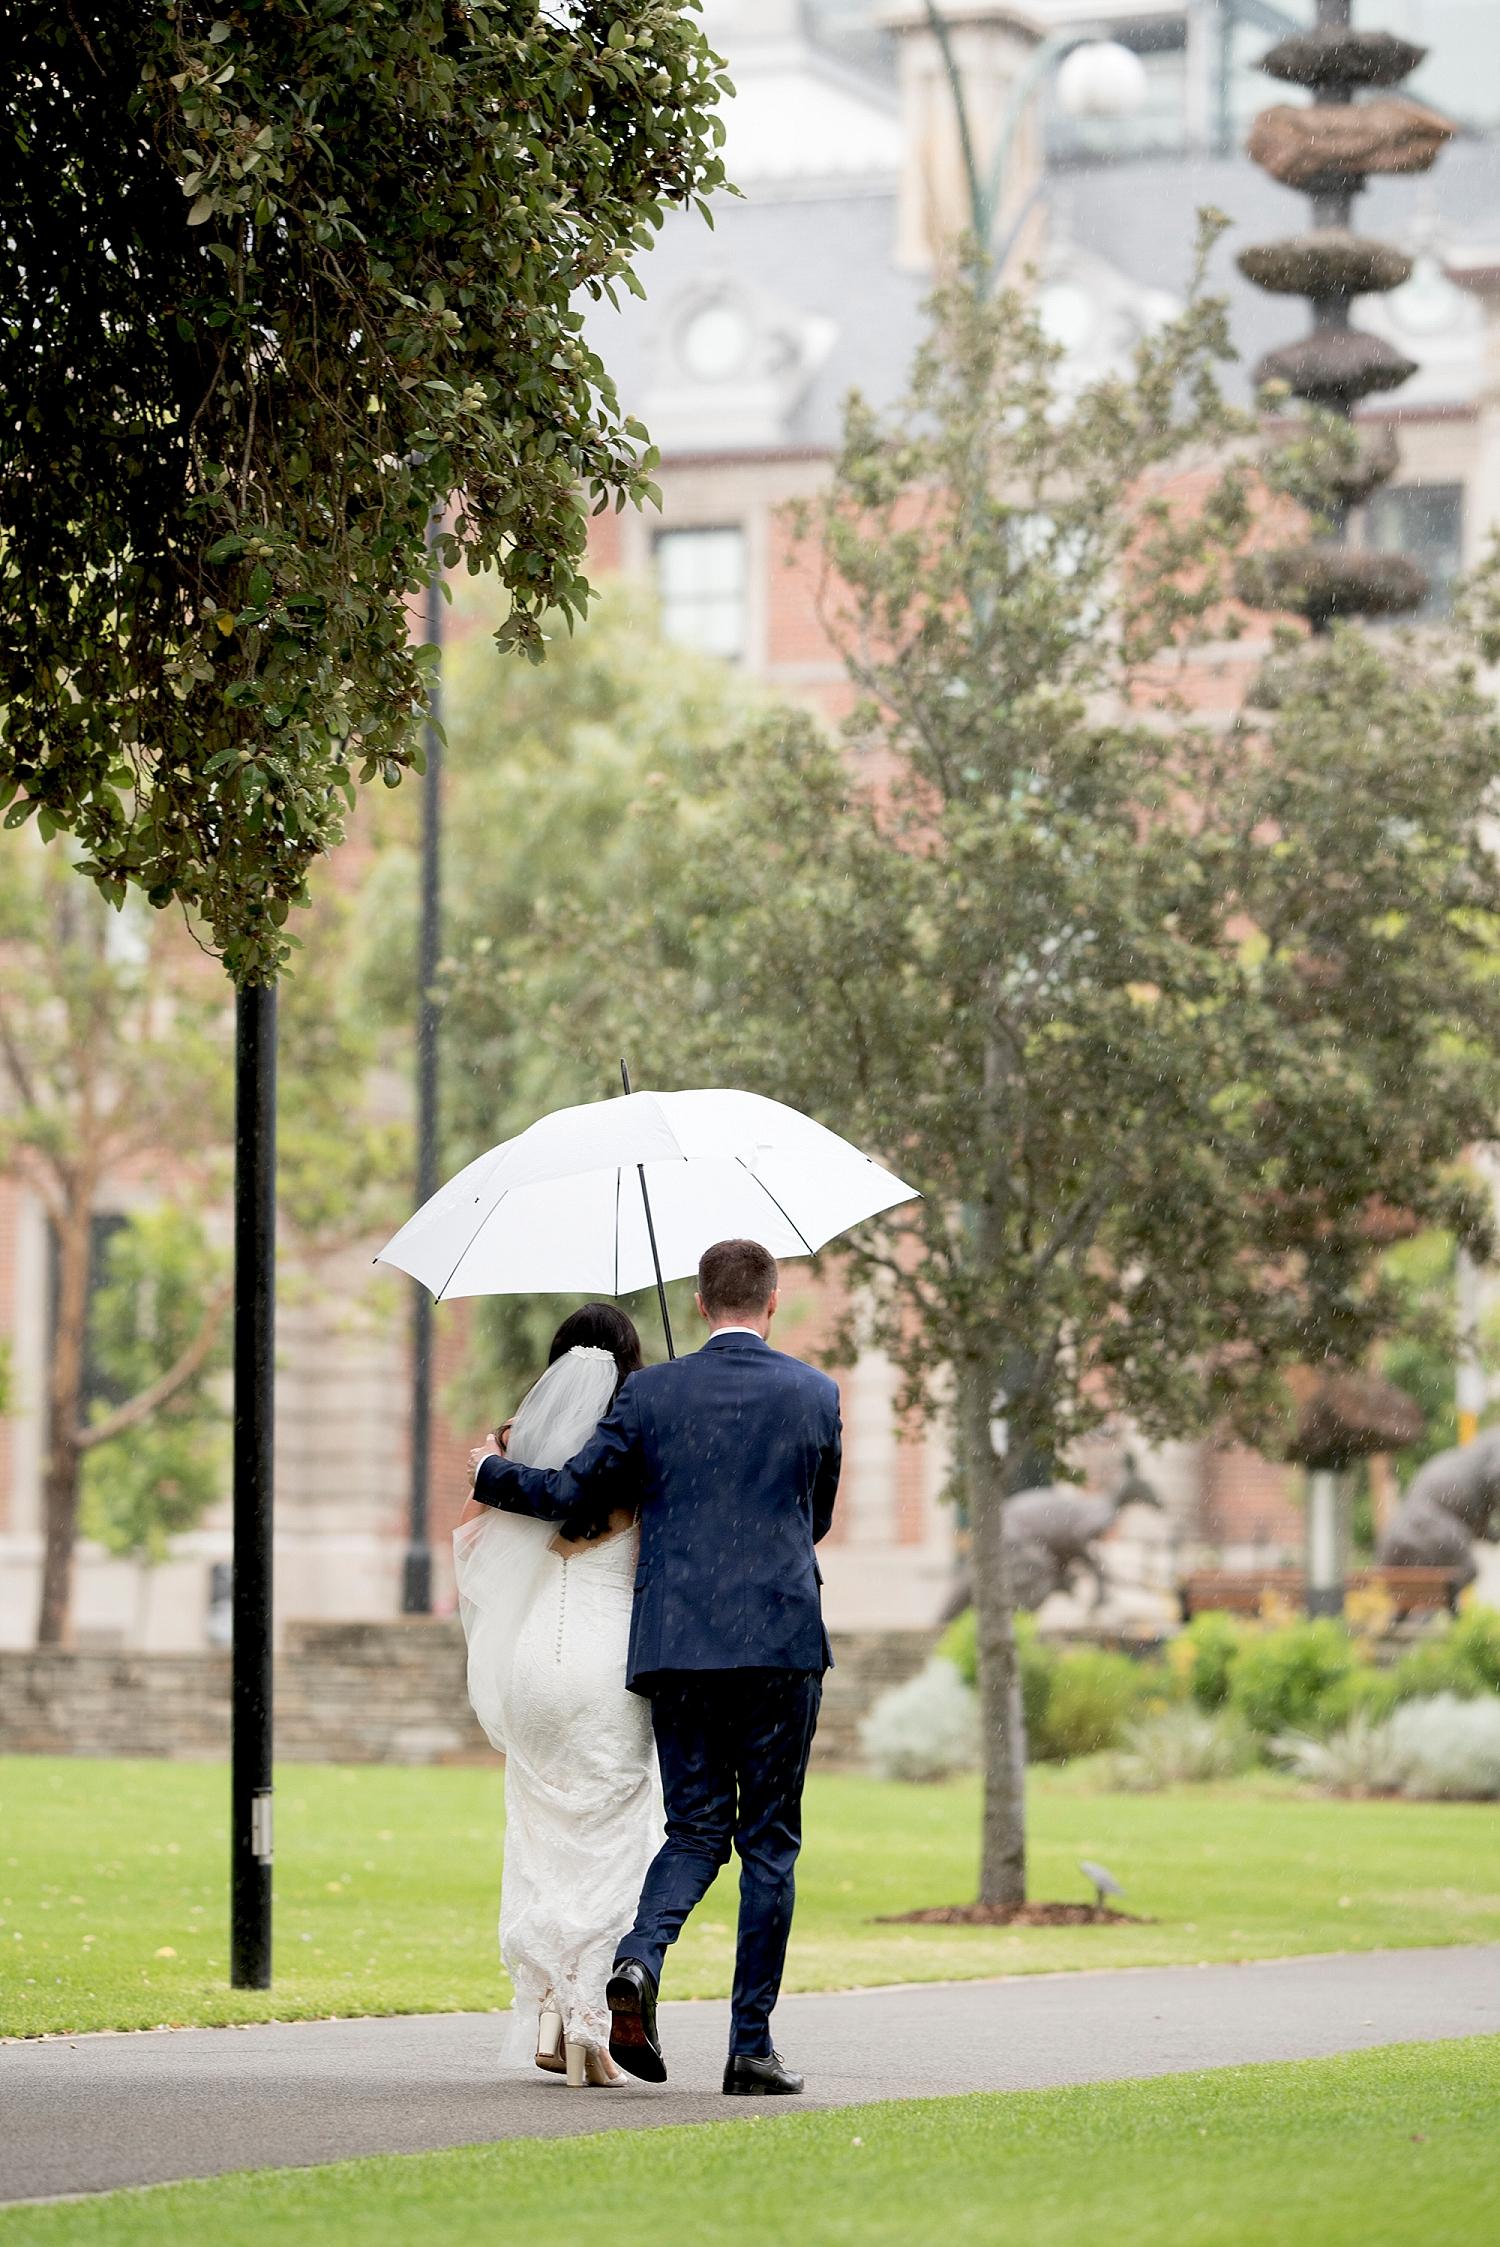 50_Perth rainy wedding umbrellas.jpg